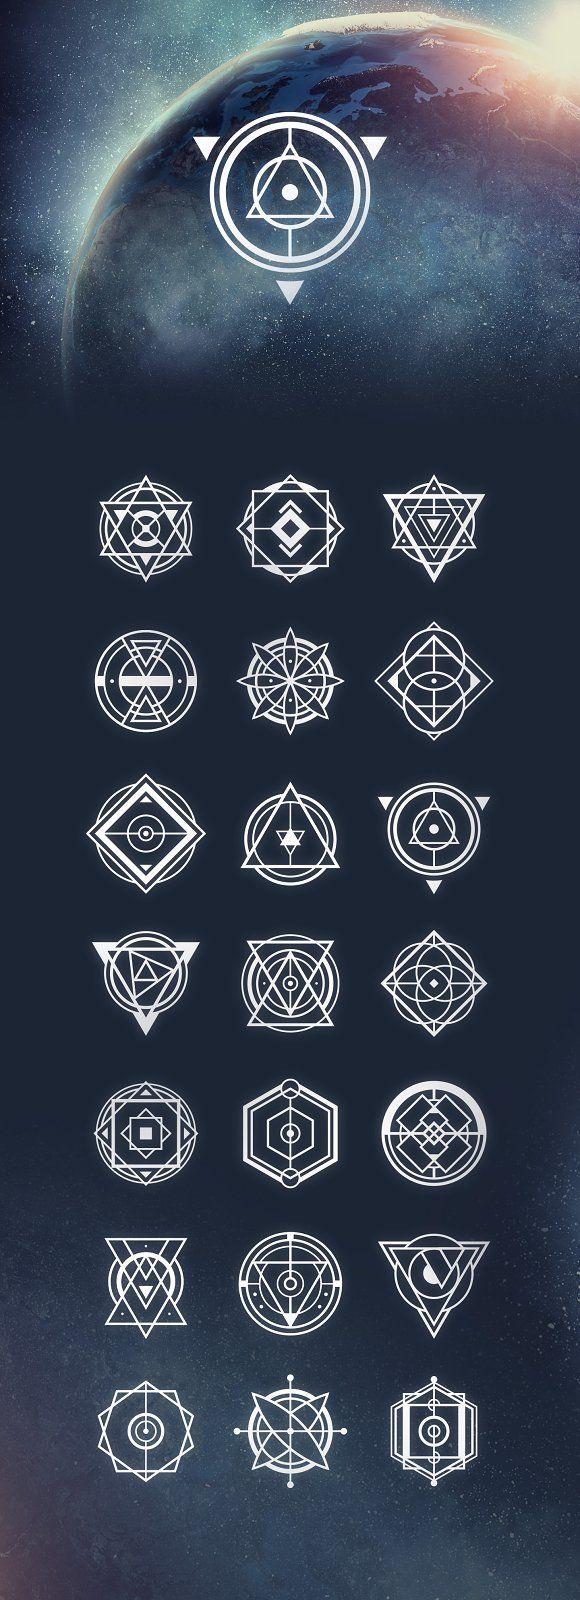 21 Sacred Geometry Vectors by Tugcu Design Co. on …